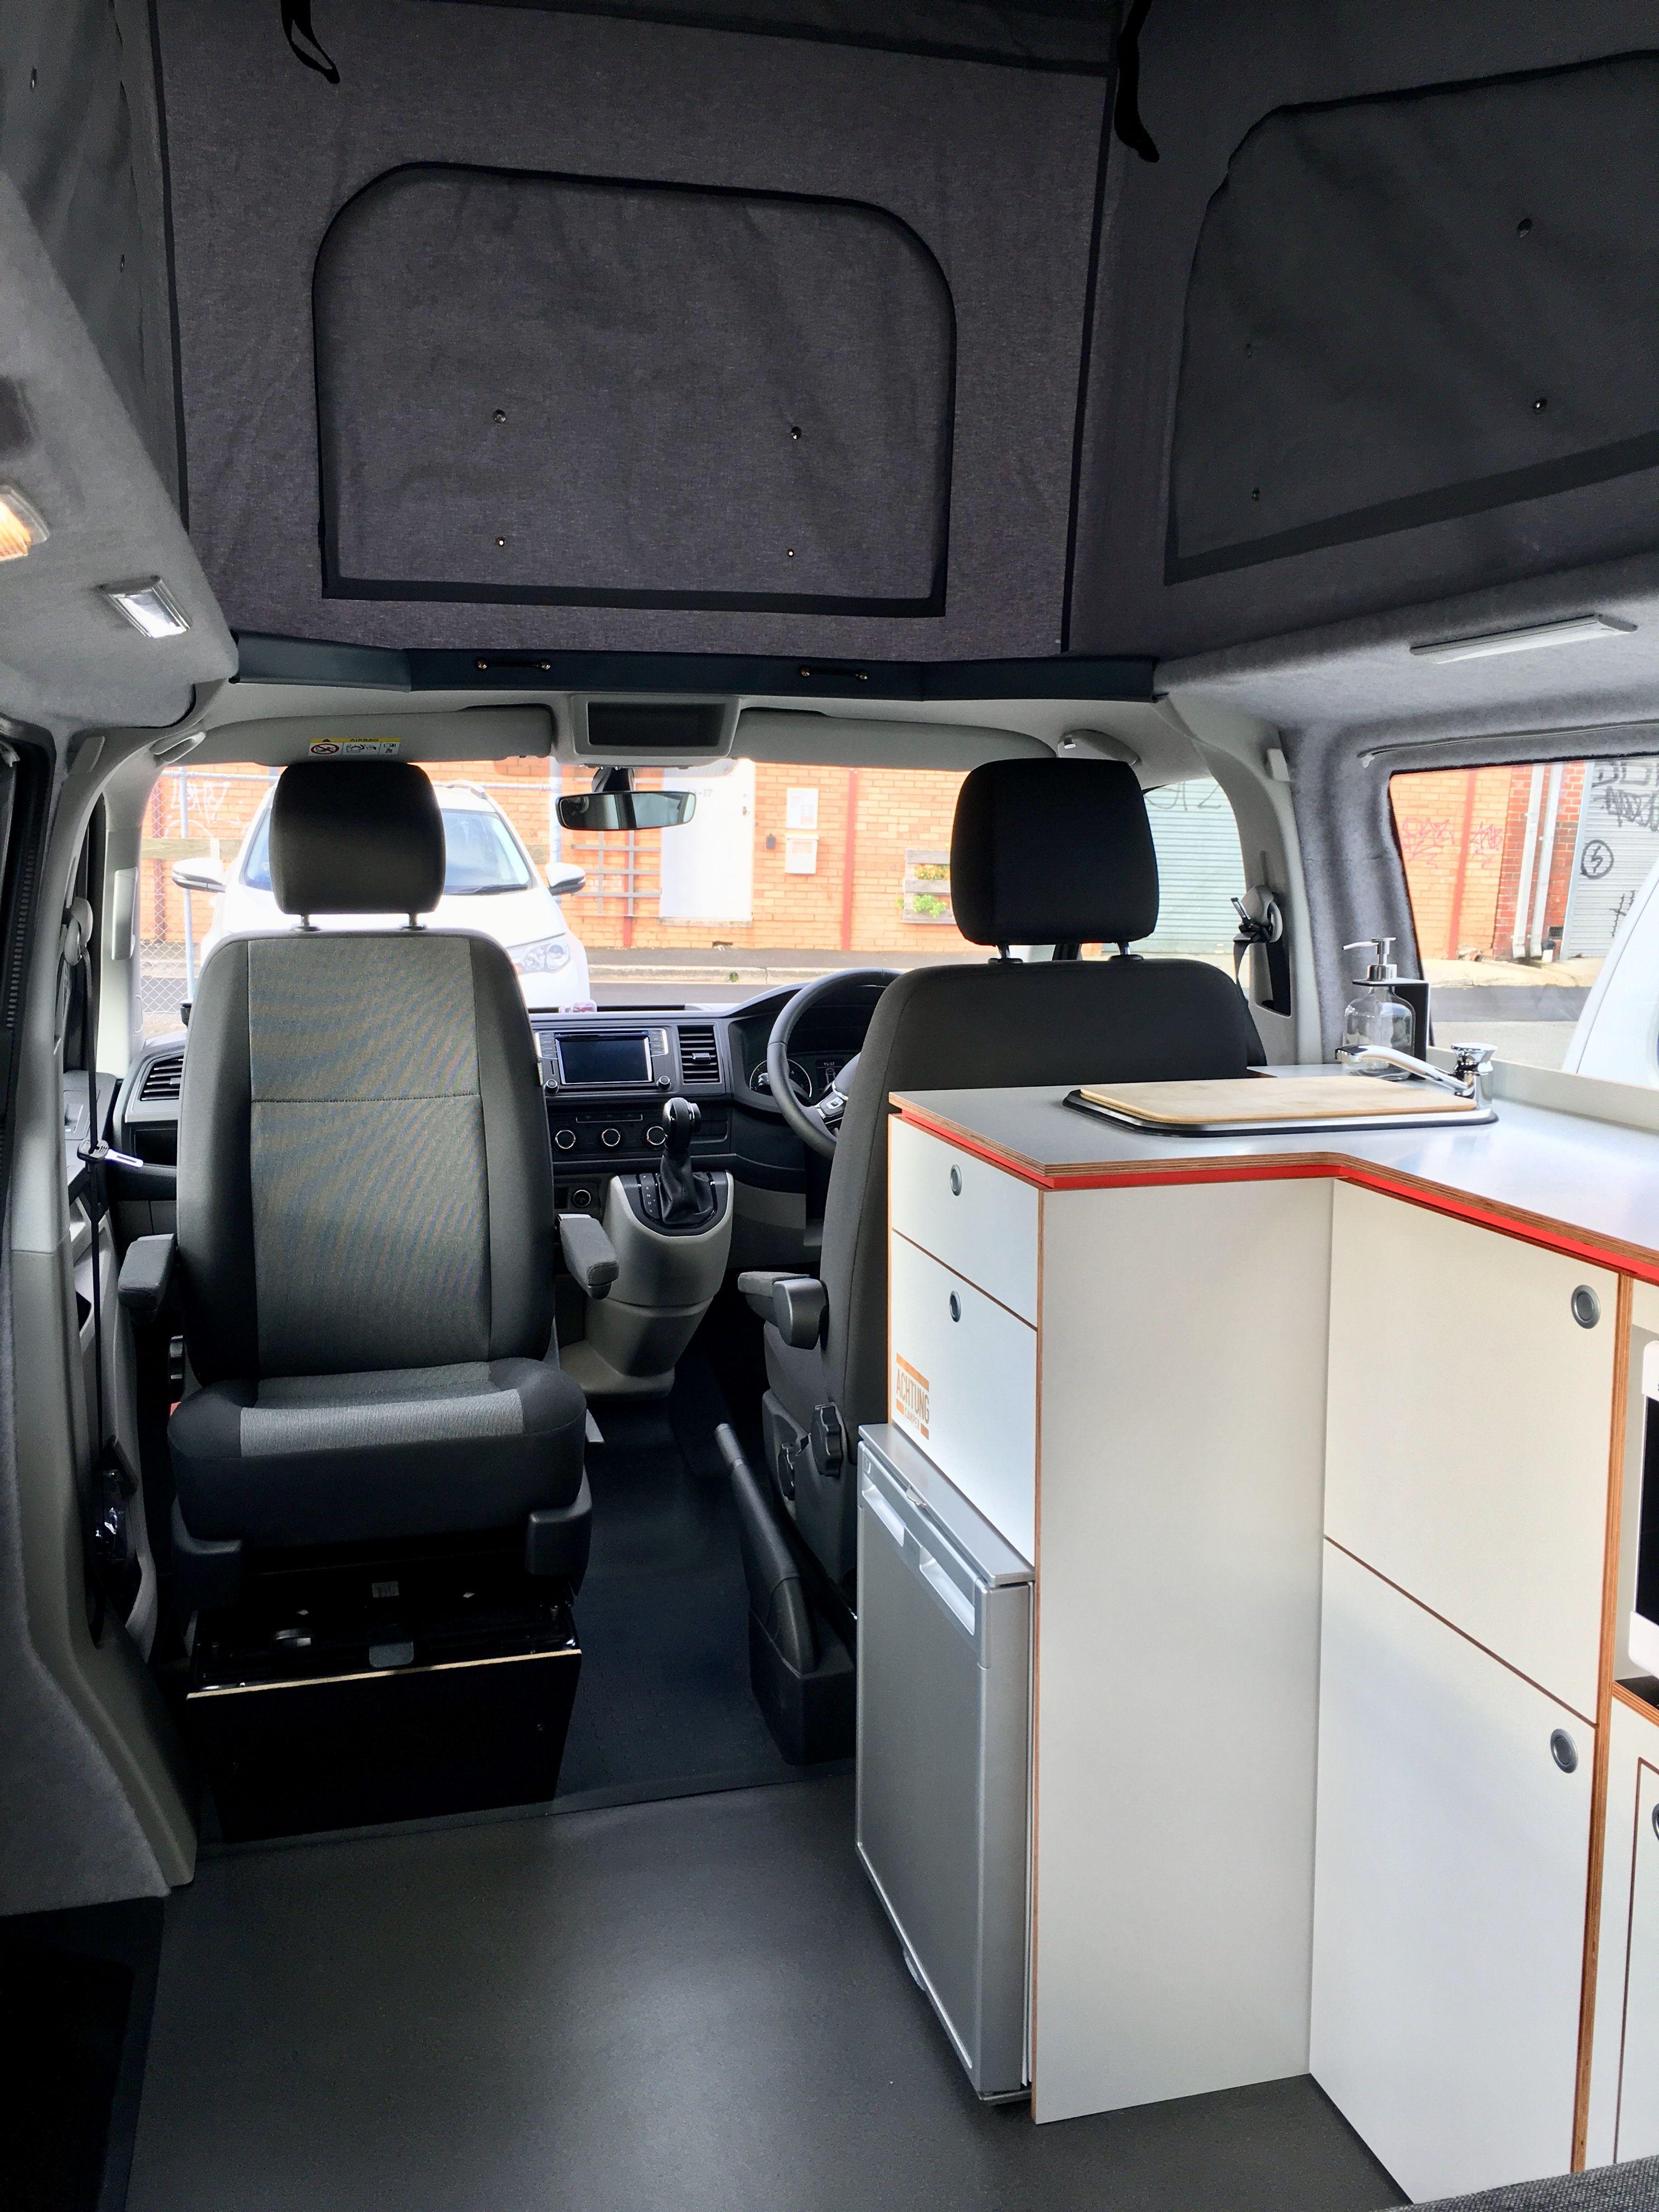 Swivel Seat Base Makes This Van Open And Functional Van Conversion Campervan Vw Campervans For Sale Campervan